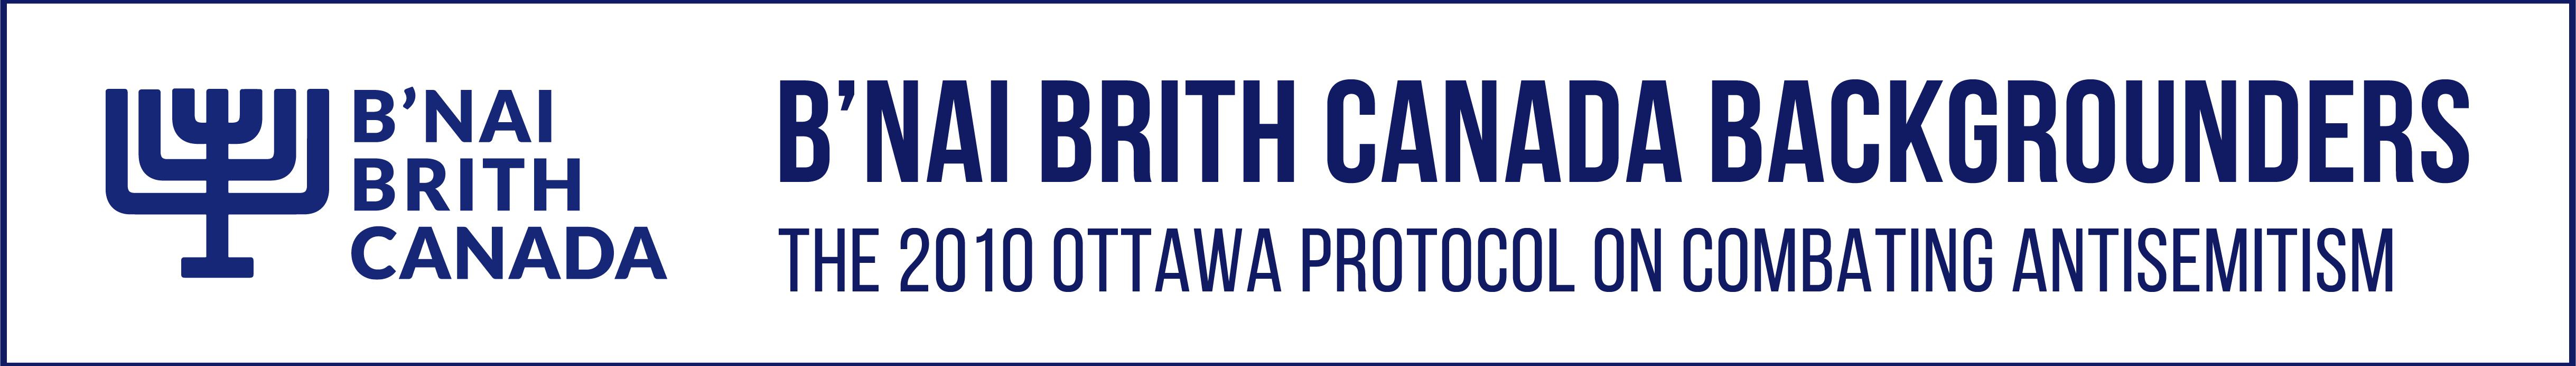 B'nai Brith Backgrounders: The 2010 Ottawa Protocol on Combating Antisemitism